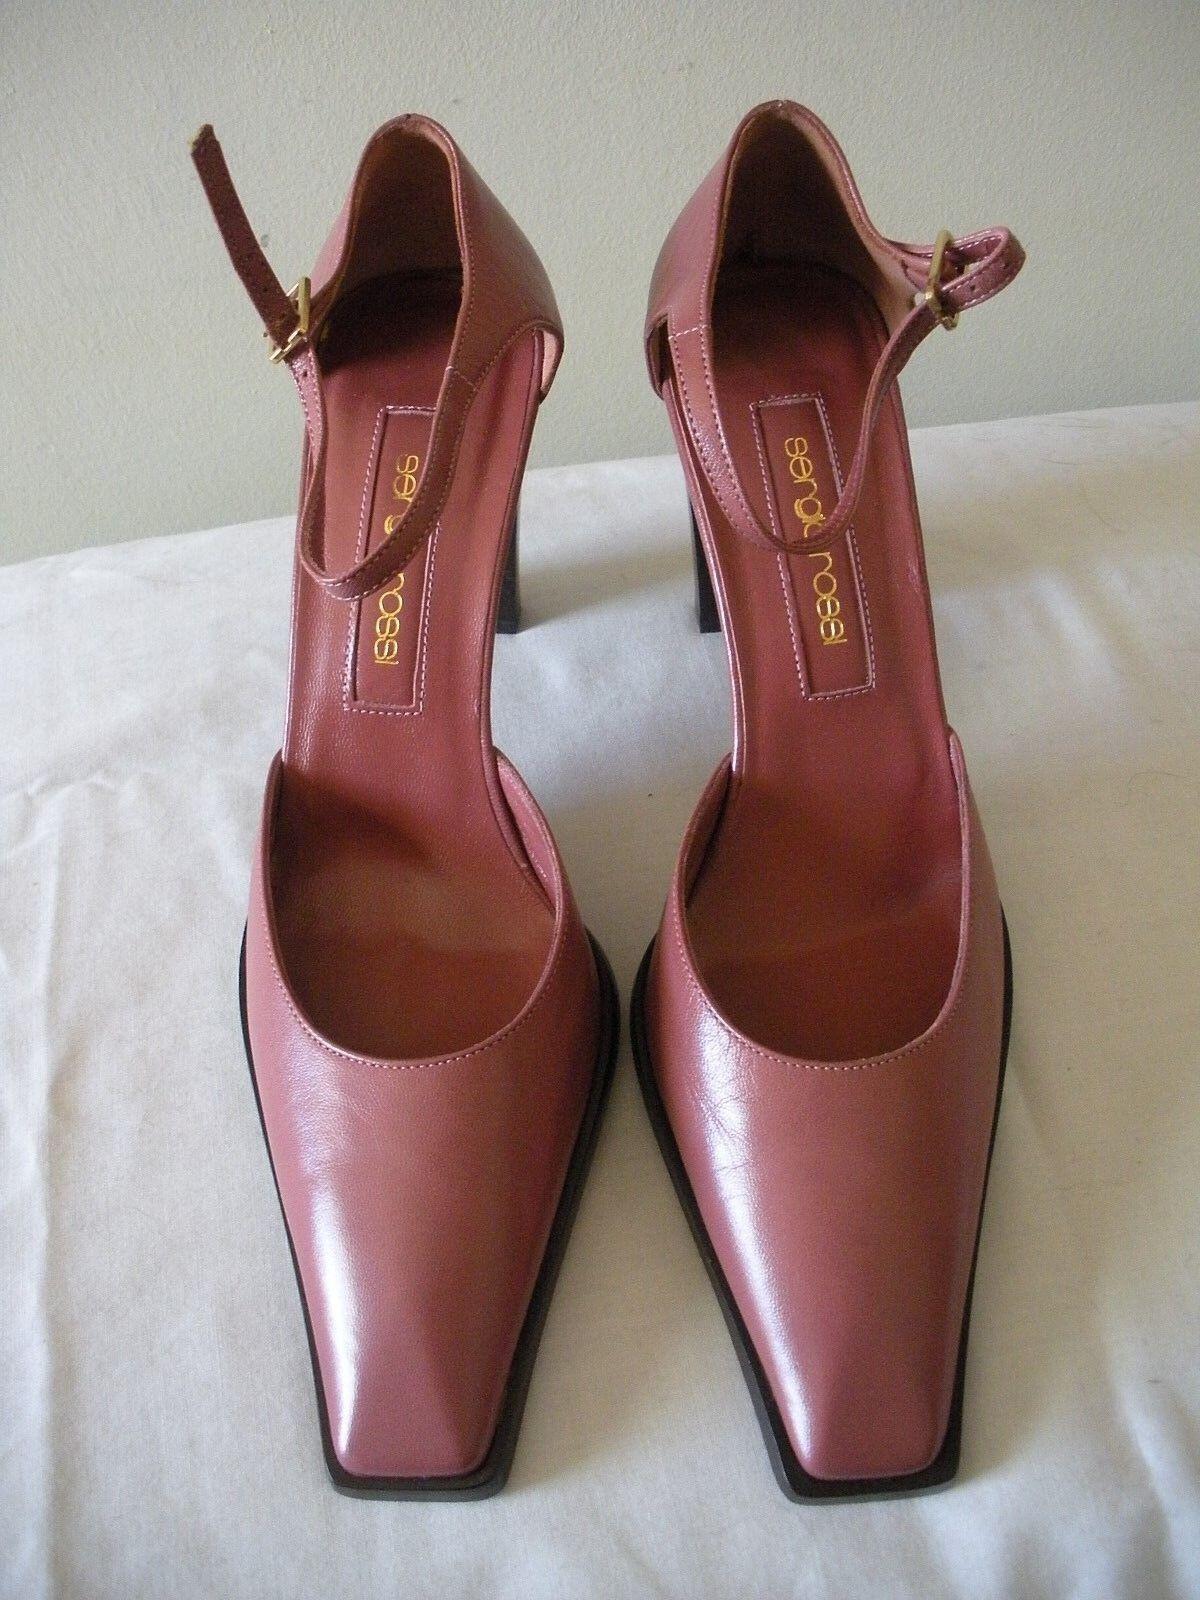 SEXY NIB  530 SERGIO Ankle ROSSI Rosa Rosa Leather Ankle SERGIO Strap schuhe ITALY 36.5M 2143ad